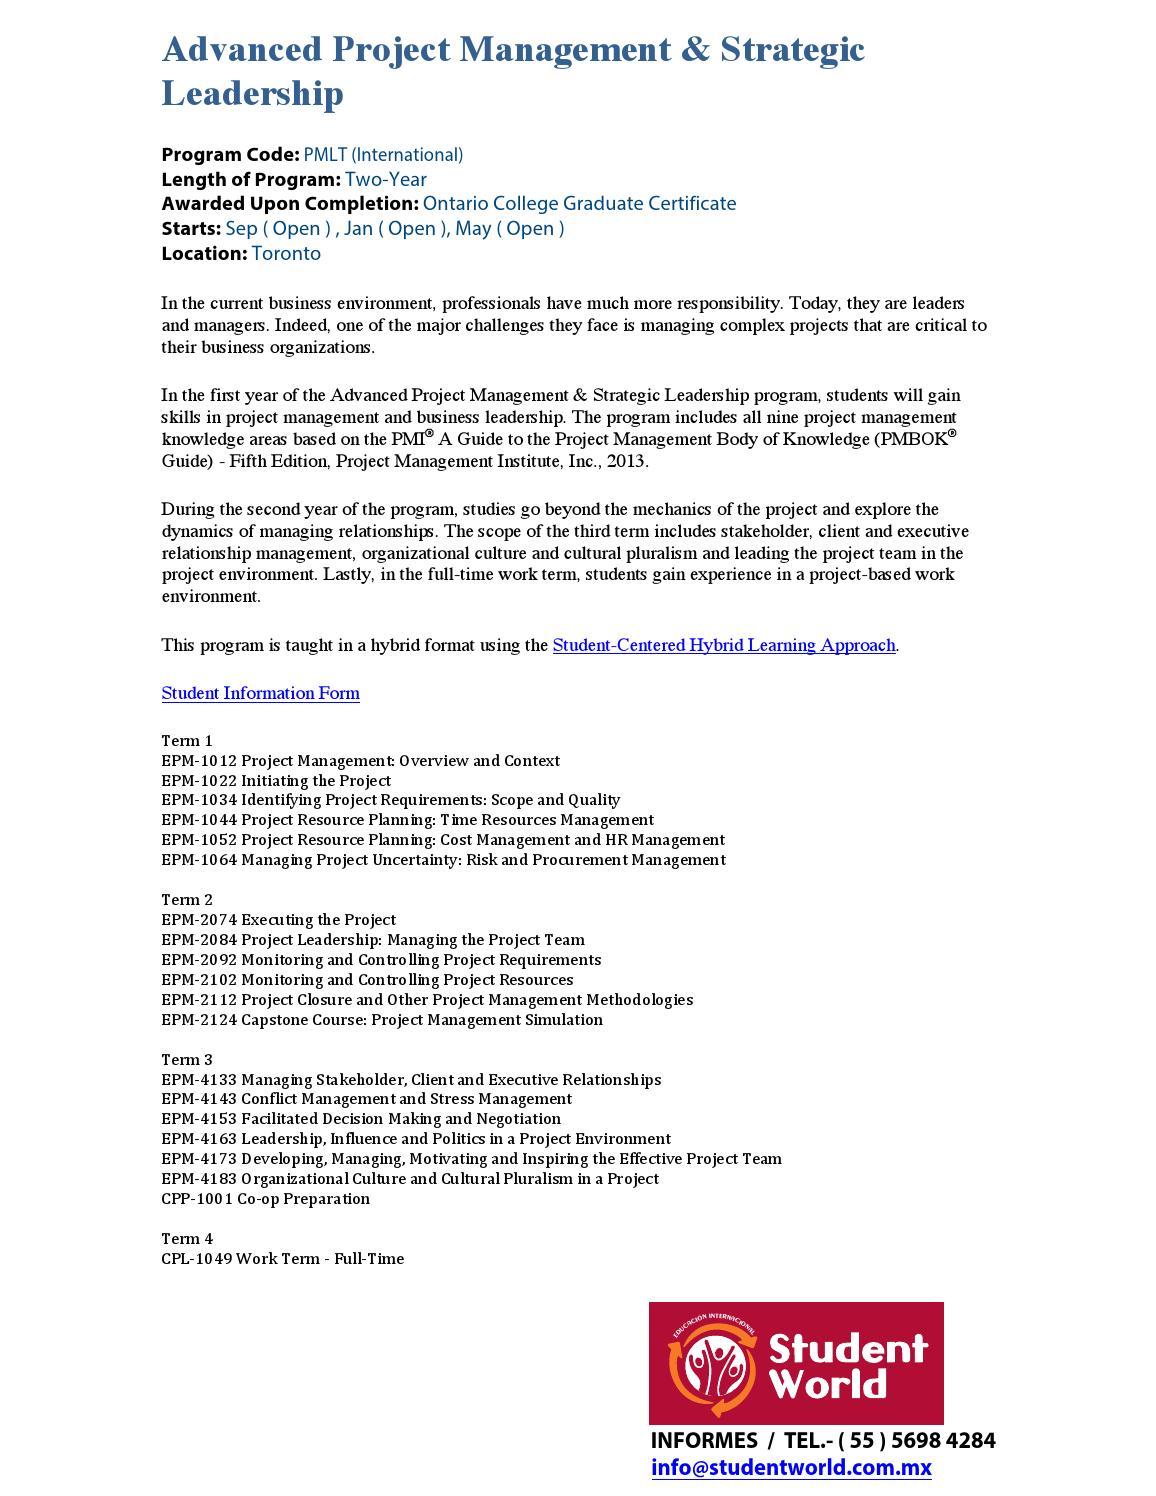 Becas Posgrados Lambton College 2016 By Student World Issuu